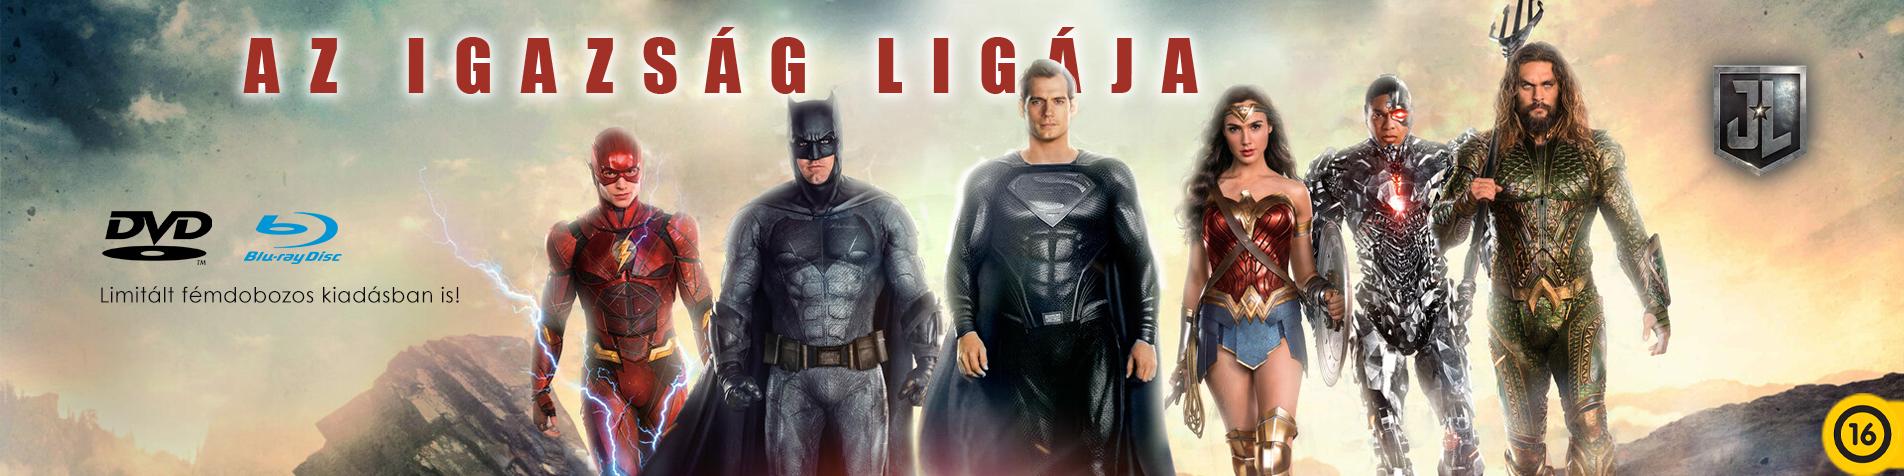 Igazság - DVD